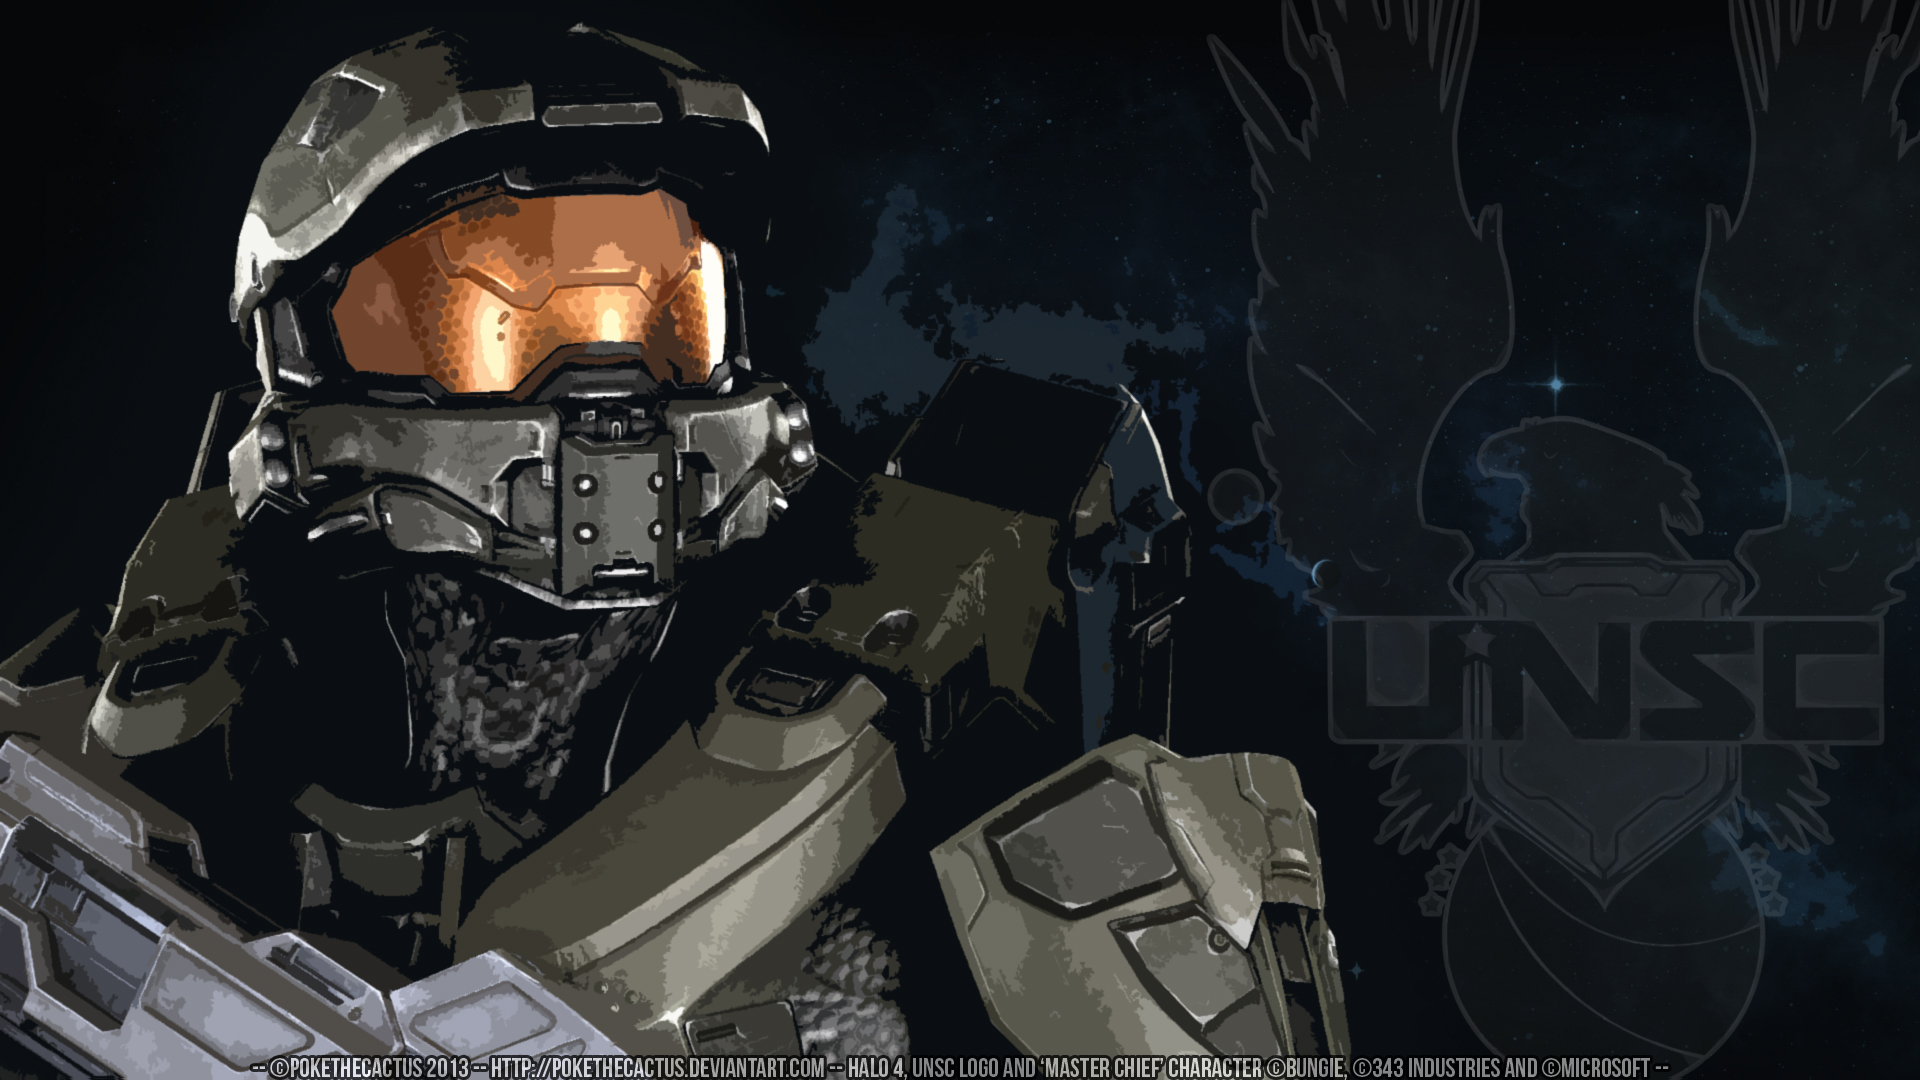 47 Halo 4 Master Chief Wallpaper On Wallpapersafari